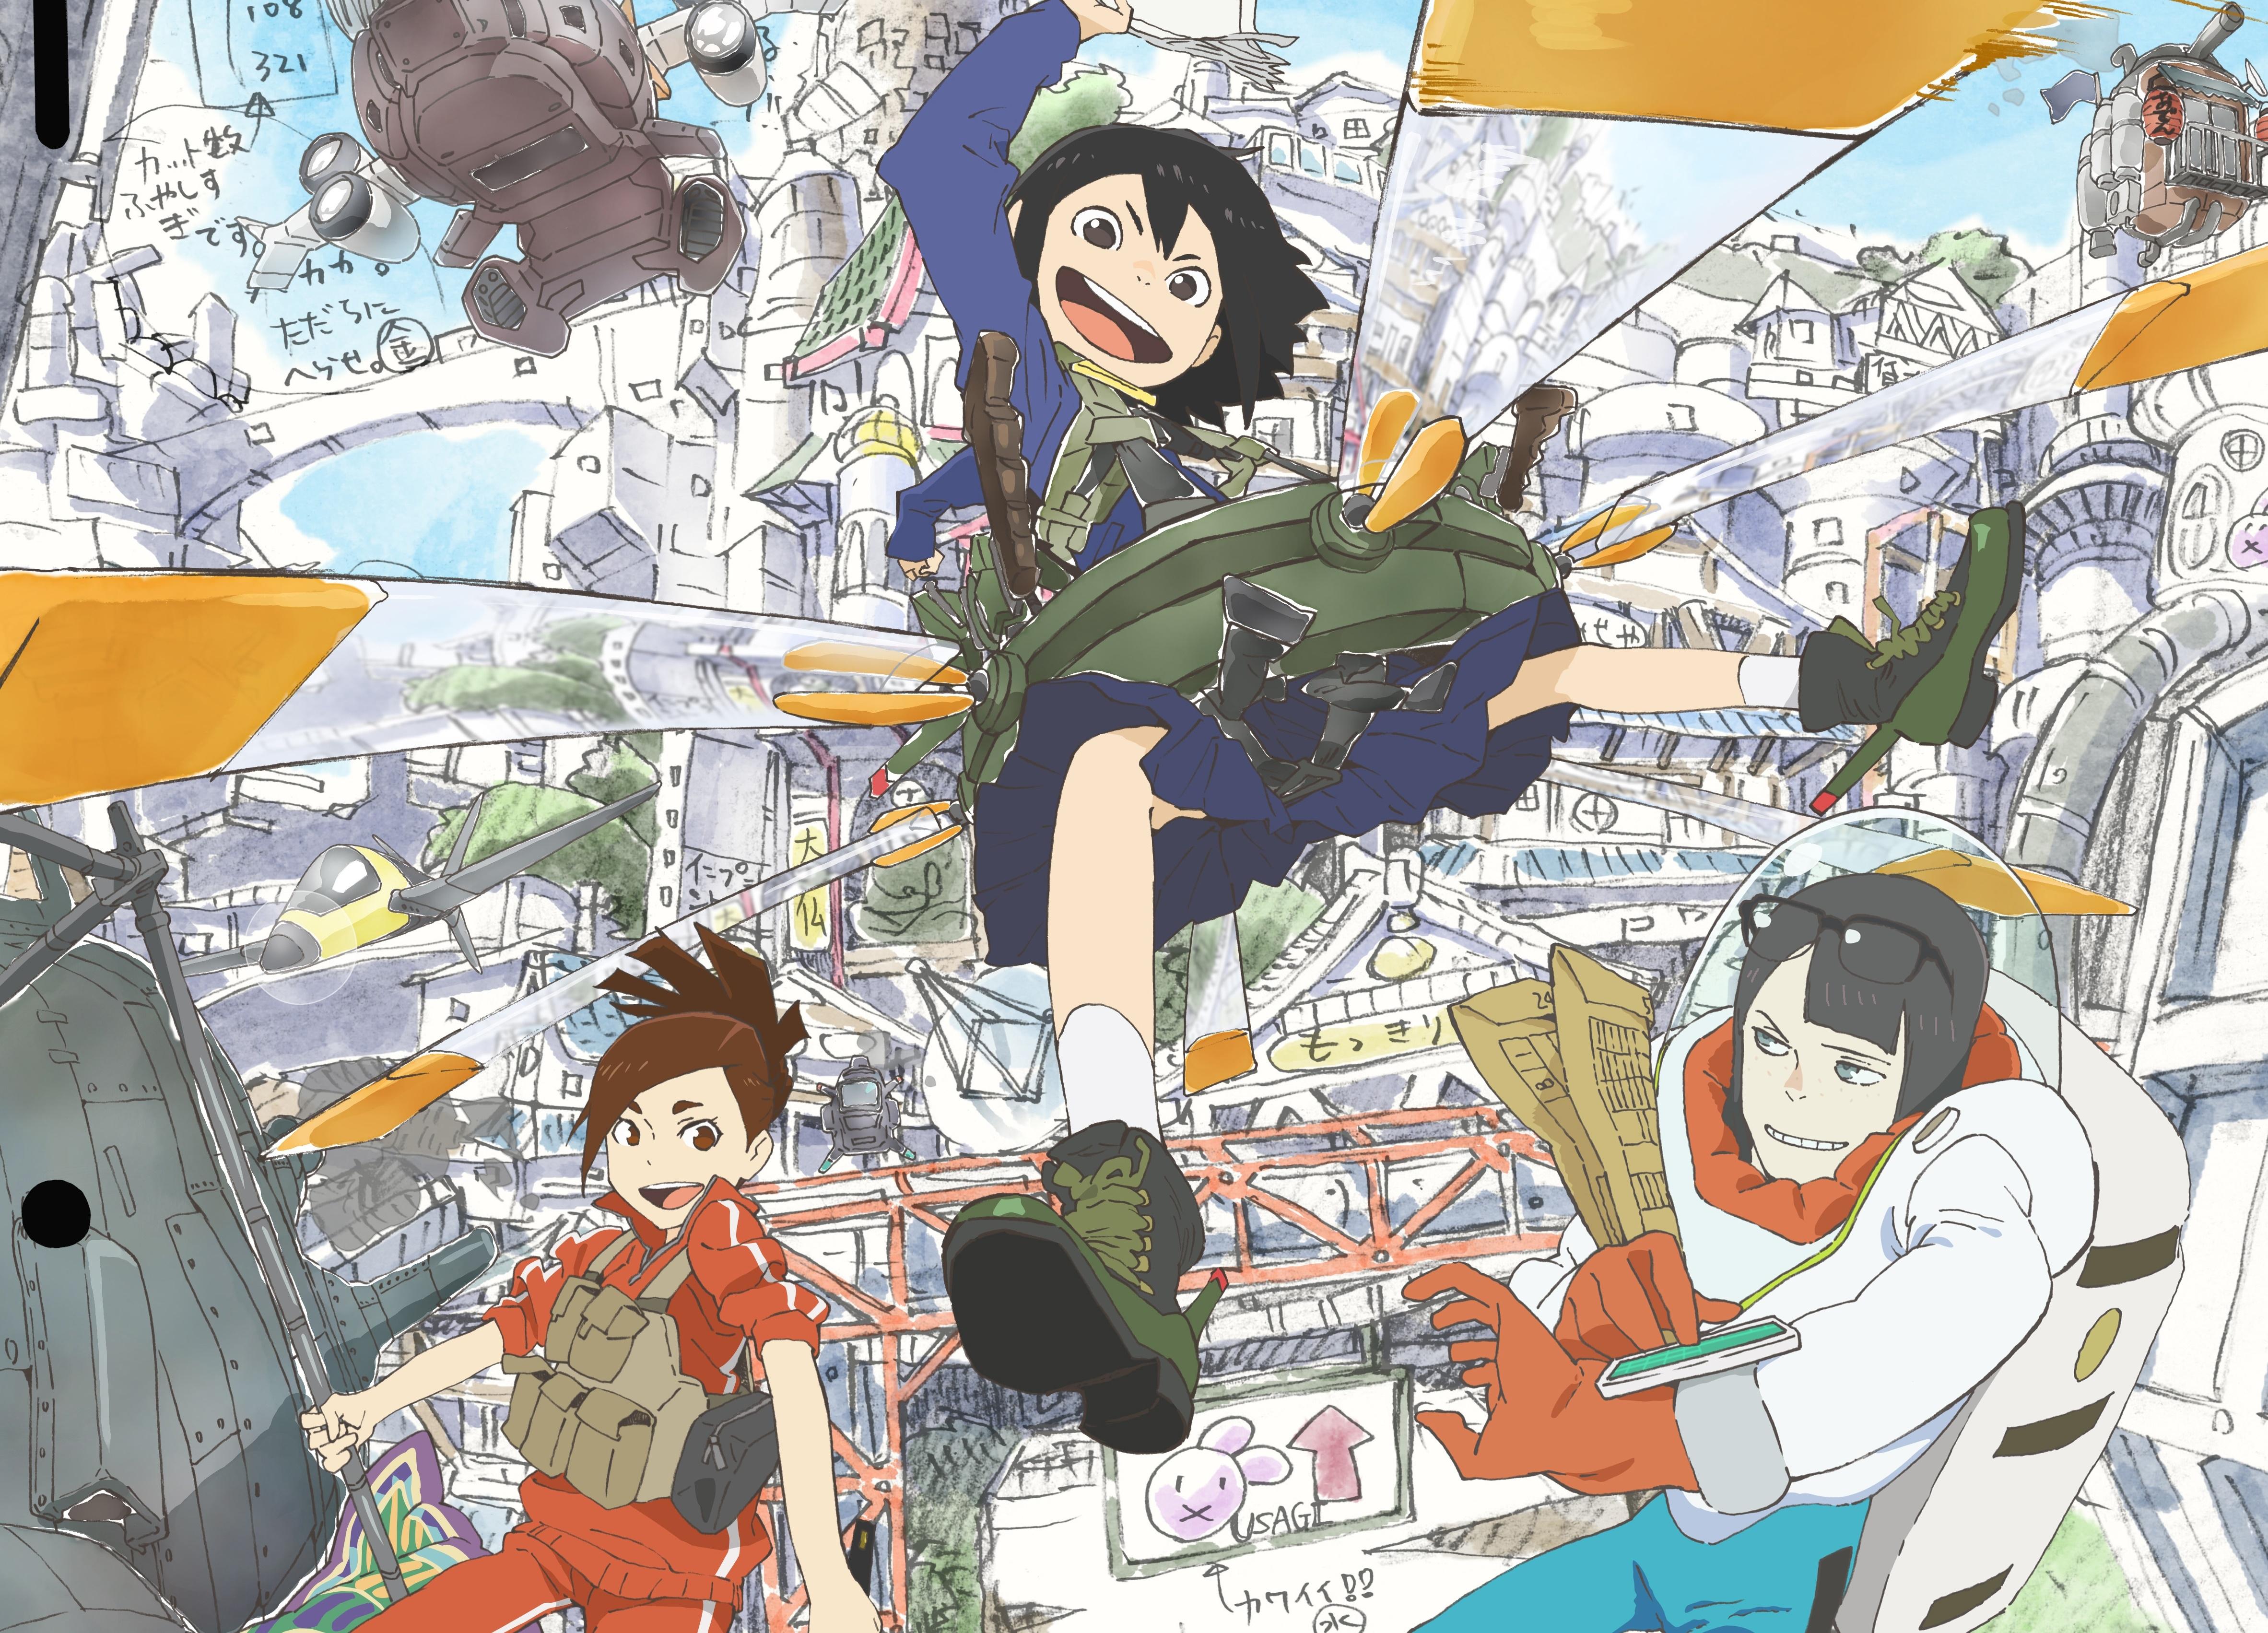 TVアニメ『映像研には手を出すな!』2020年1月5日 放送開始